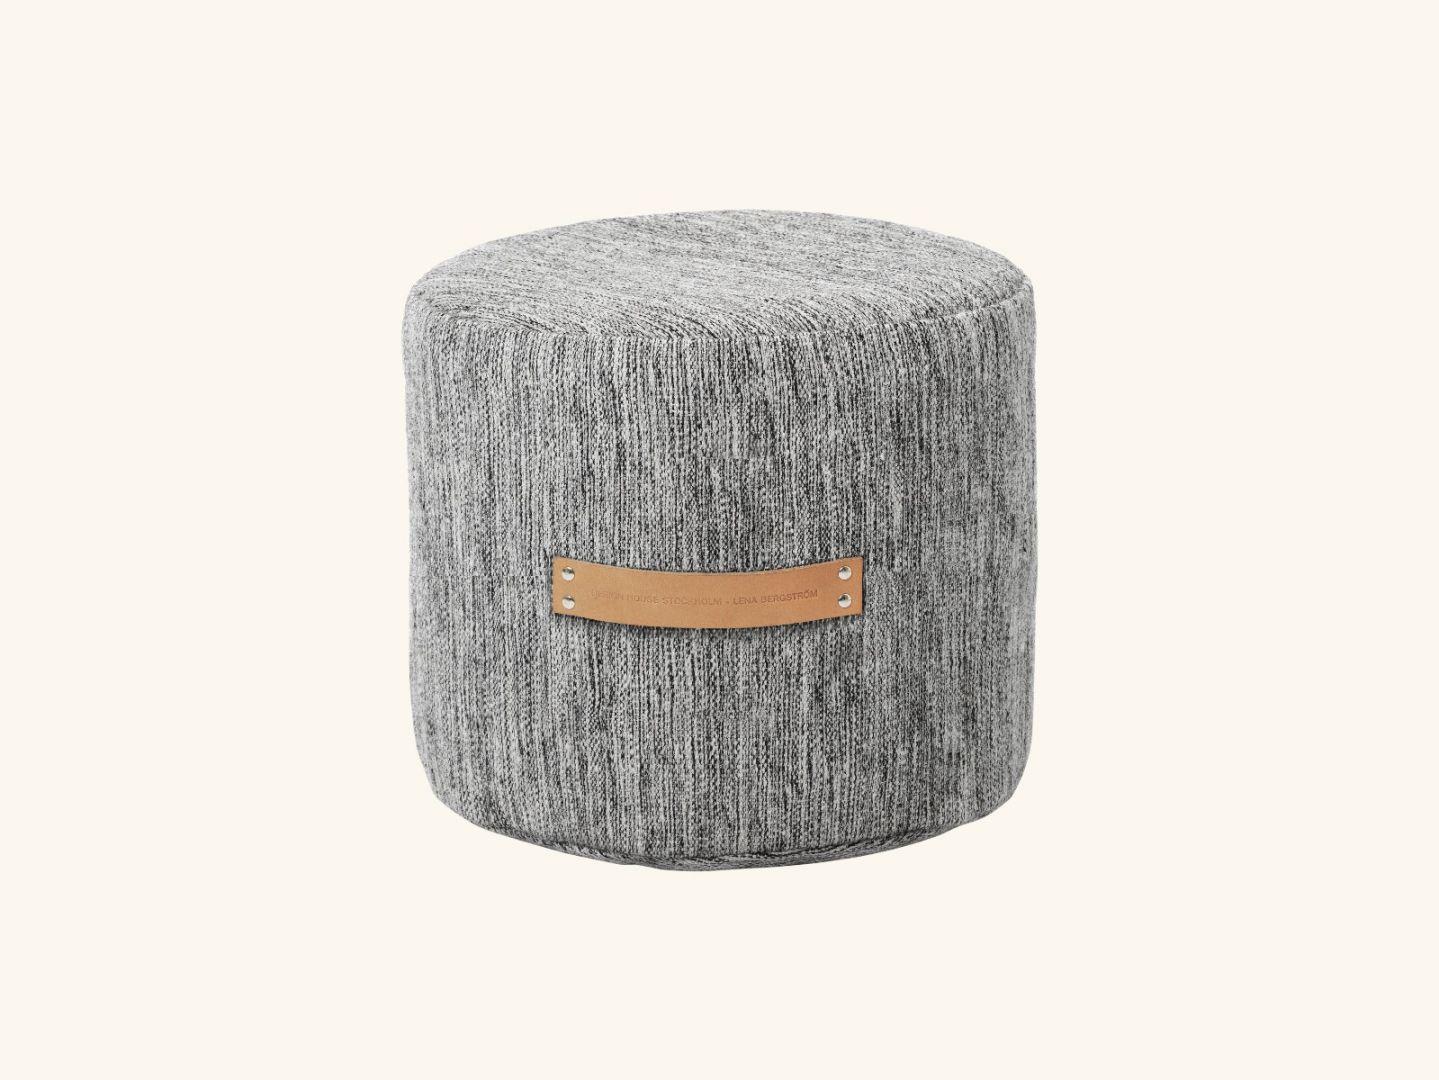 Björk stool low Light grey